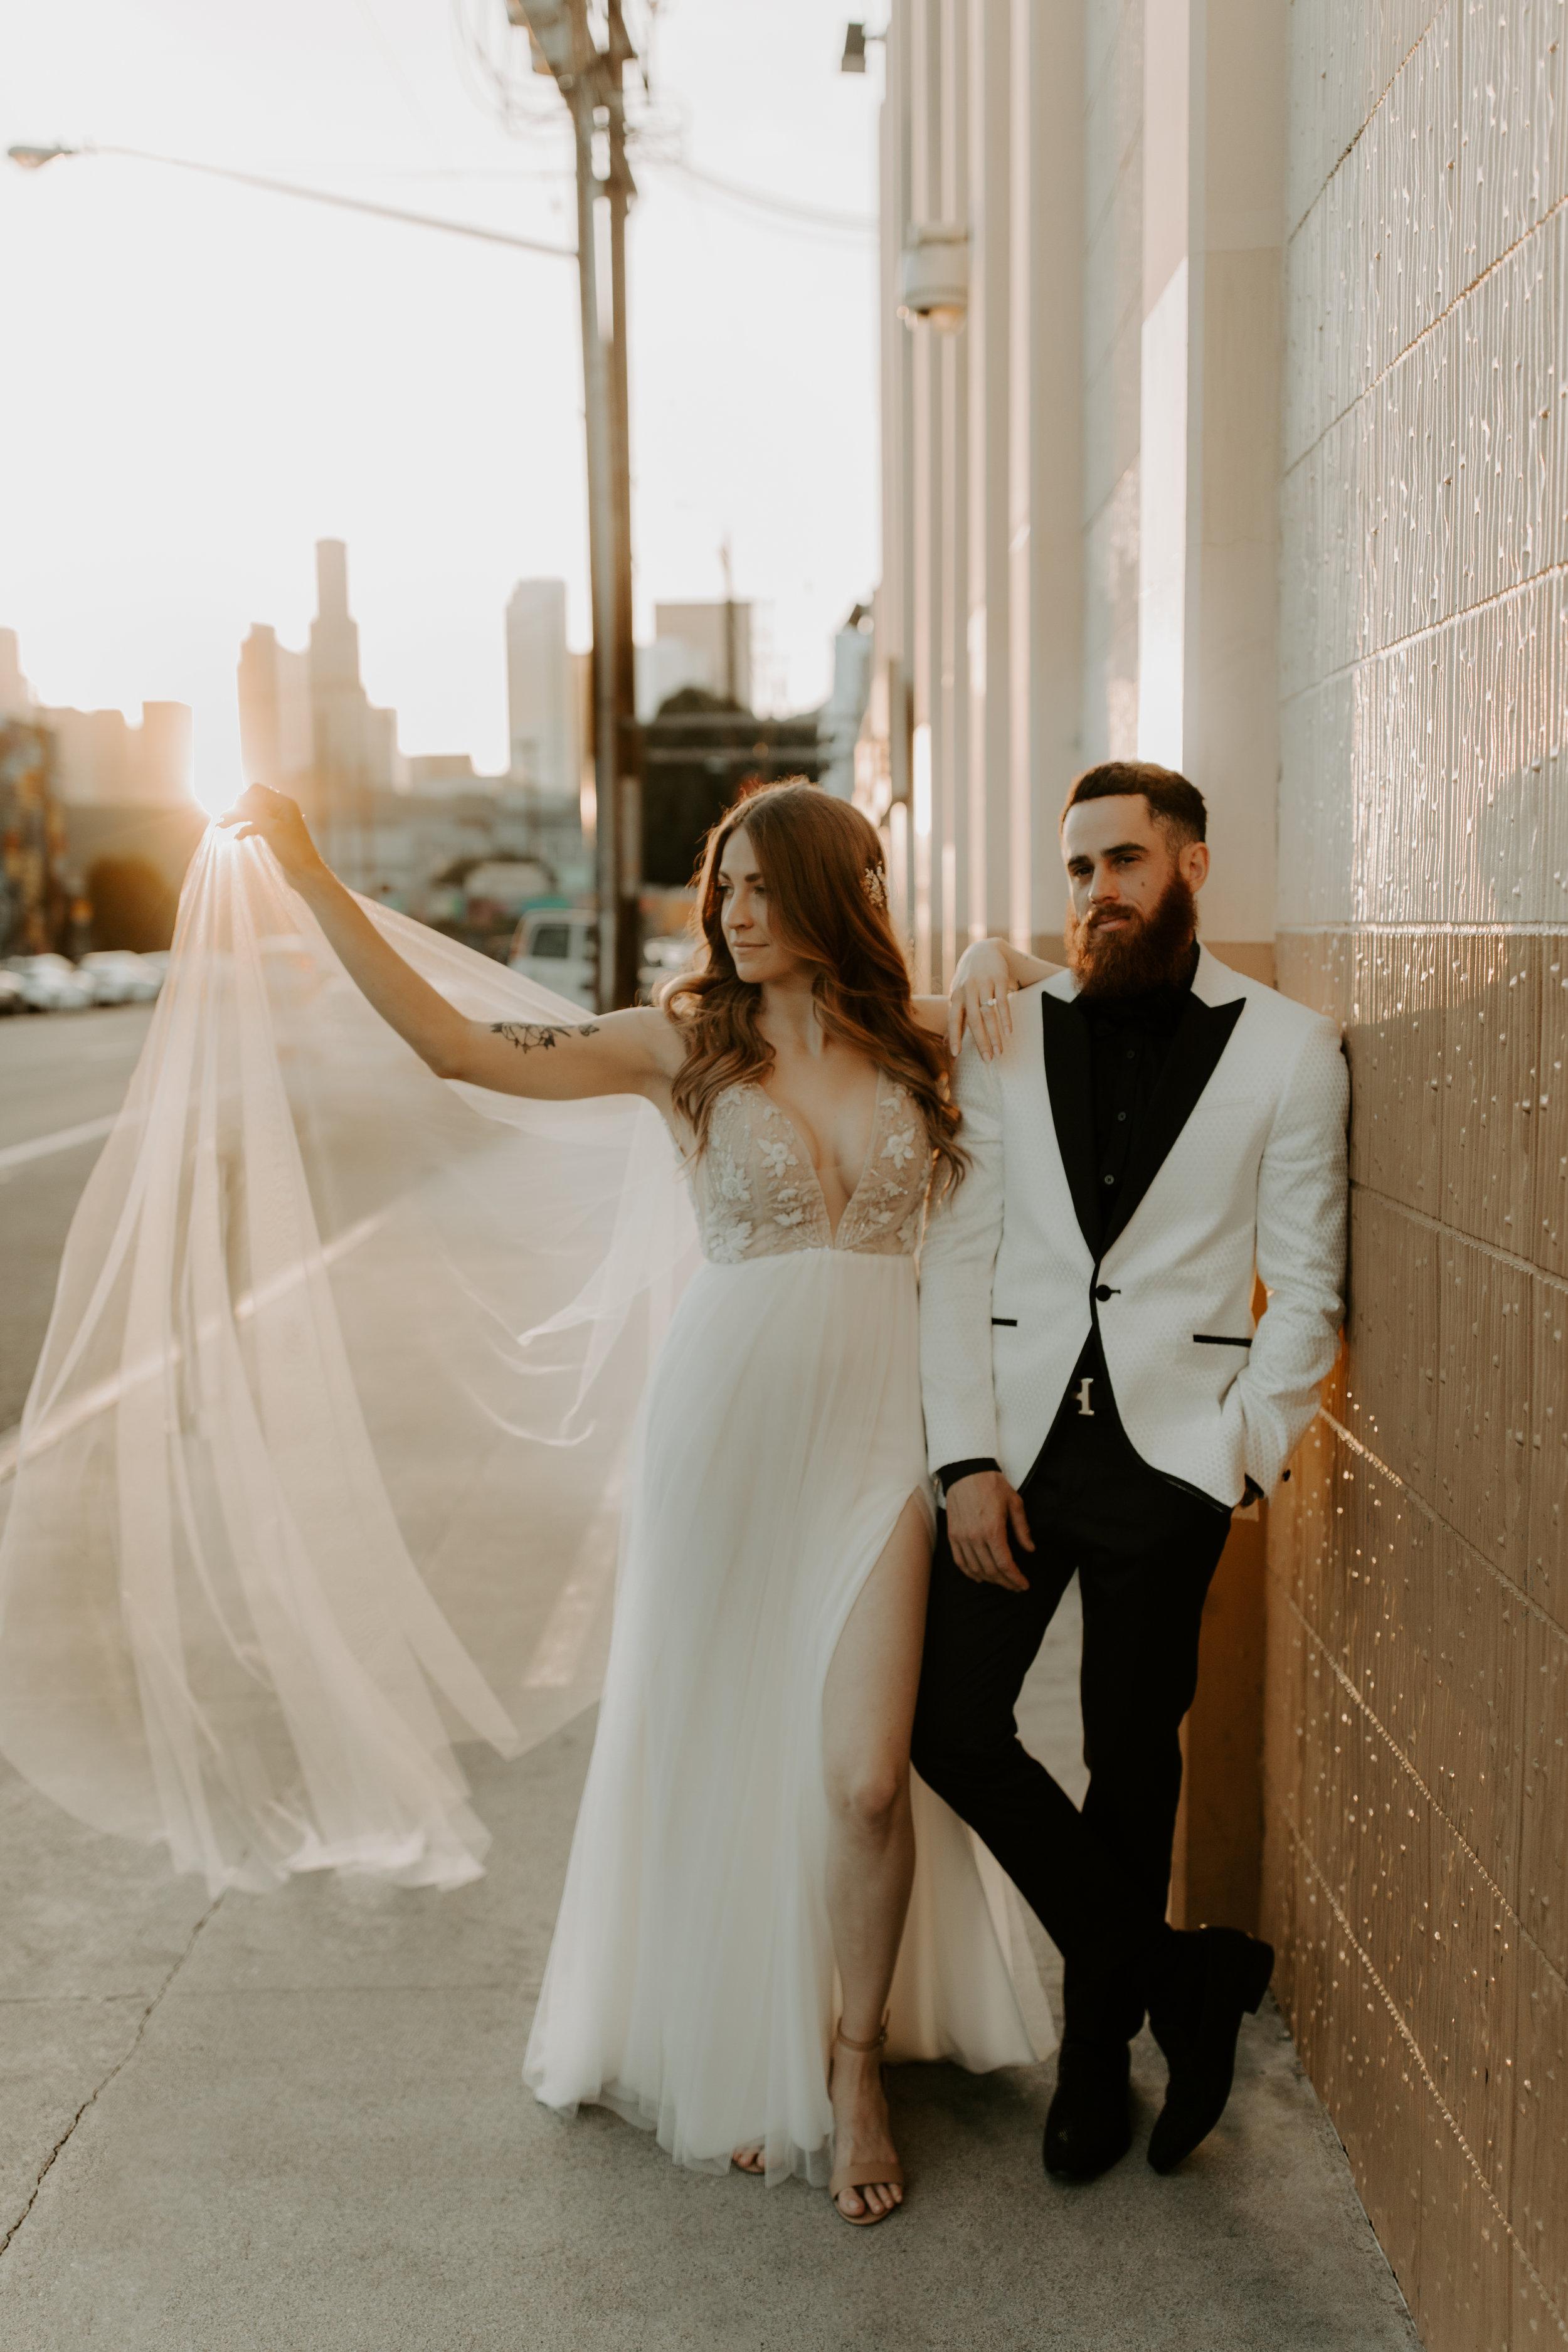 Downtown-LA-Wedding-MeganandRonny-468.jpg